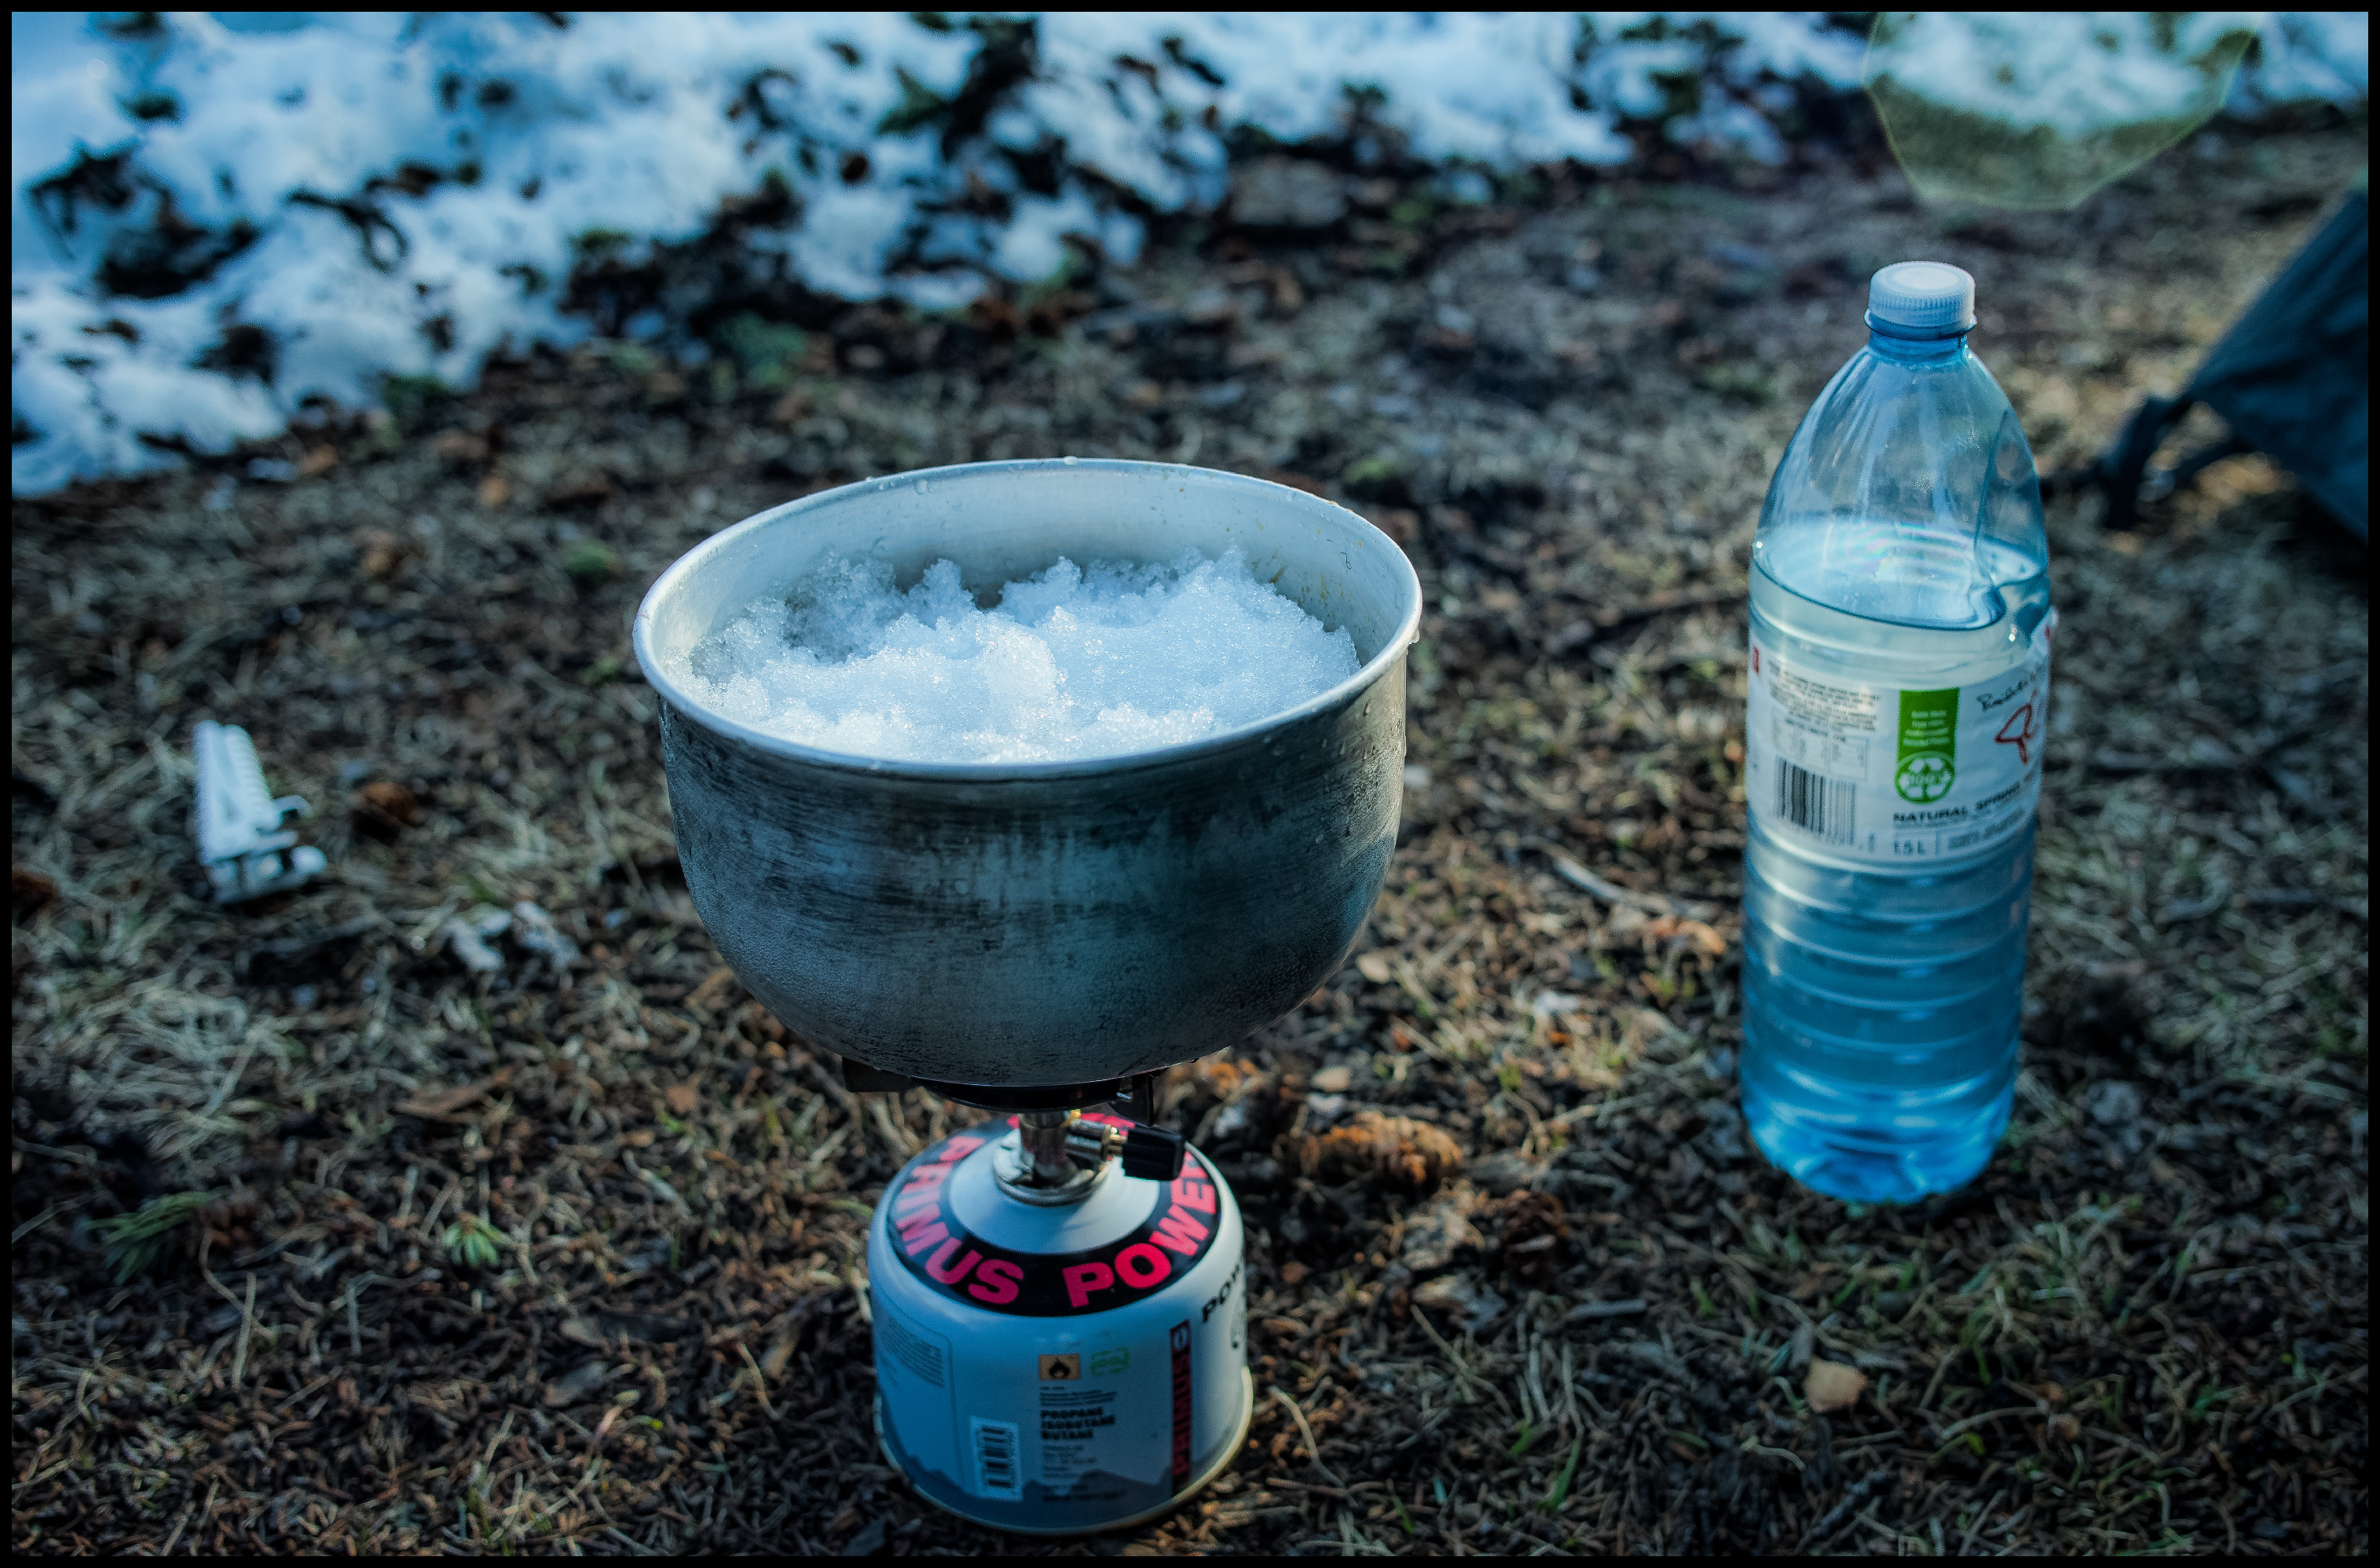 Melting ice @ Yoho Lake Winter Camp Sony A7 / Canon FD Tilt Shift 35 2.8